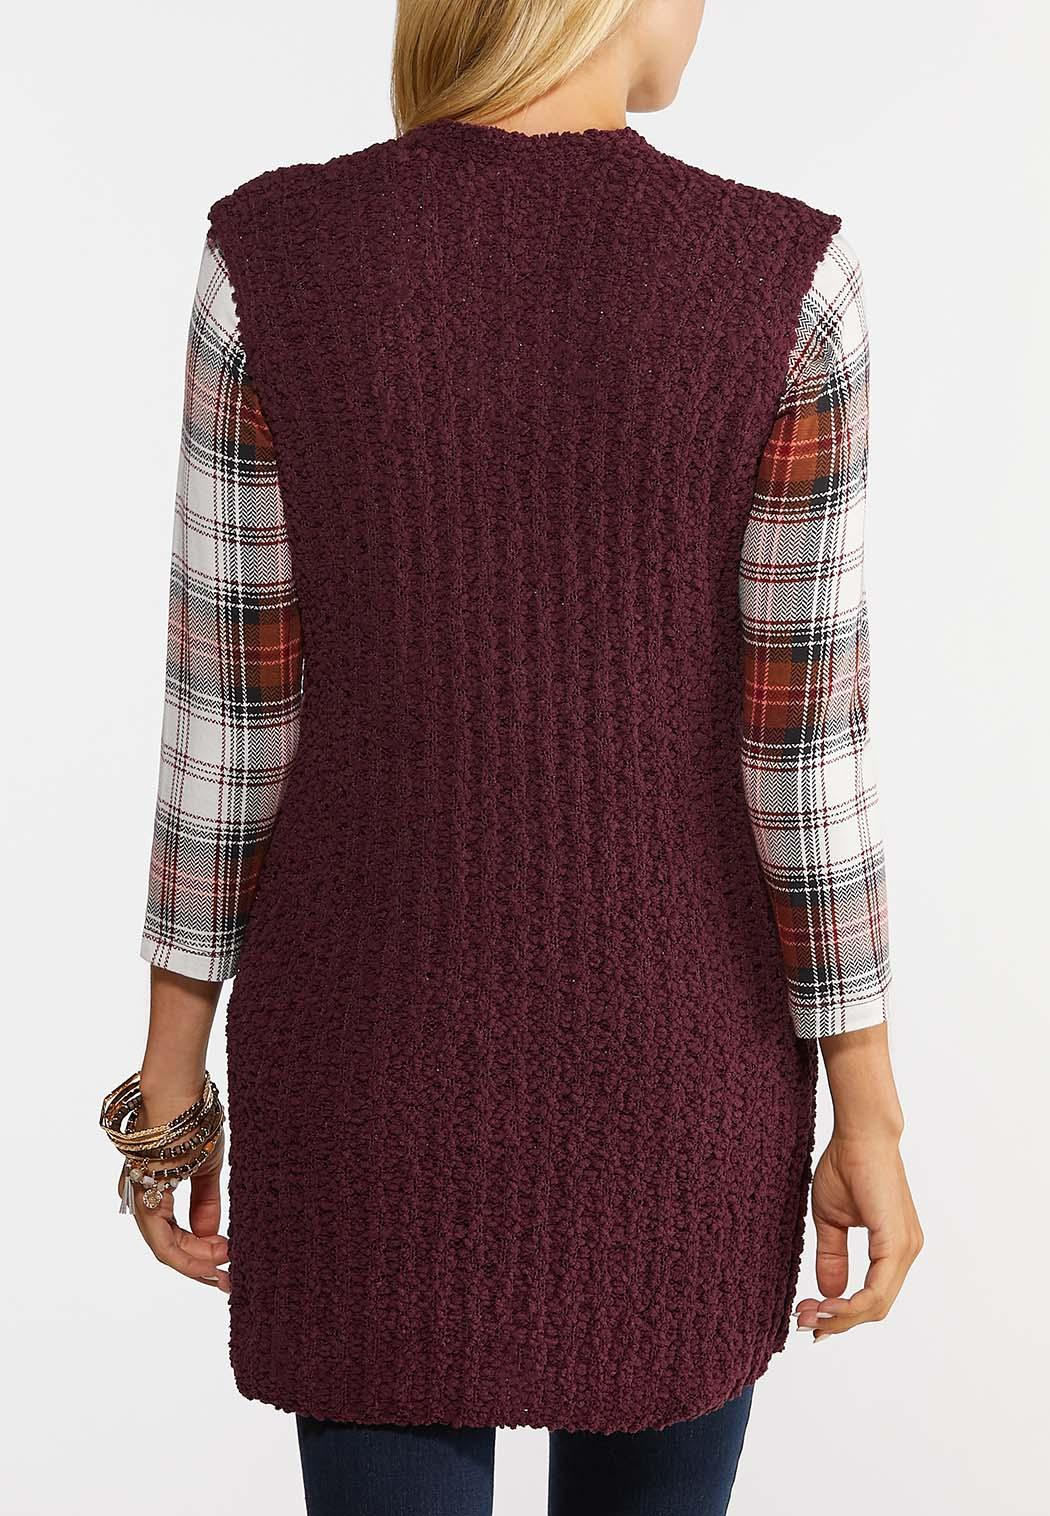 Teddy Duster Sweater Vest (Item #44385387)